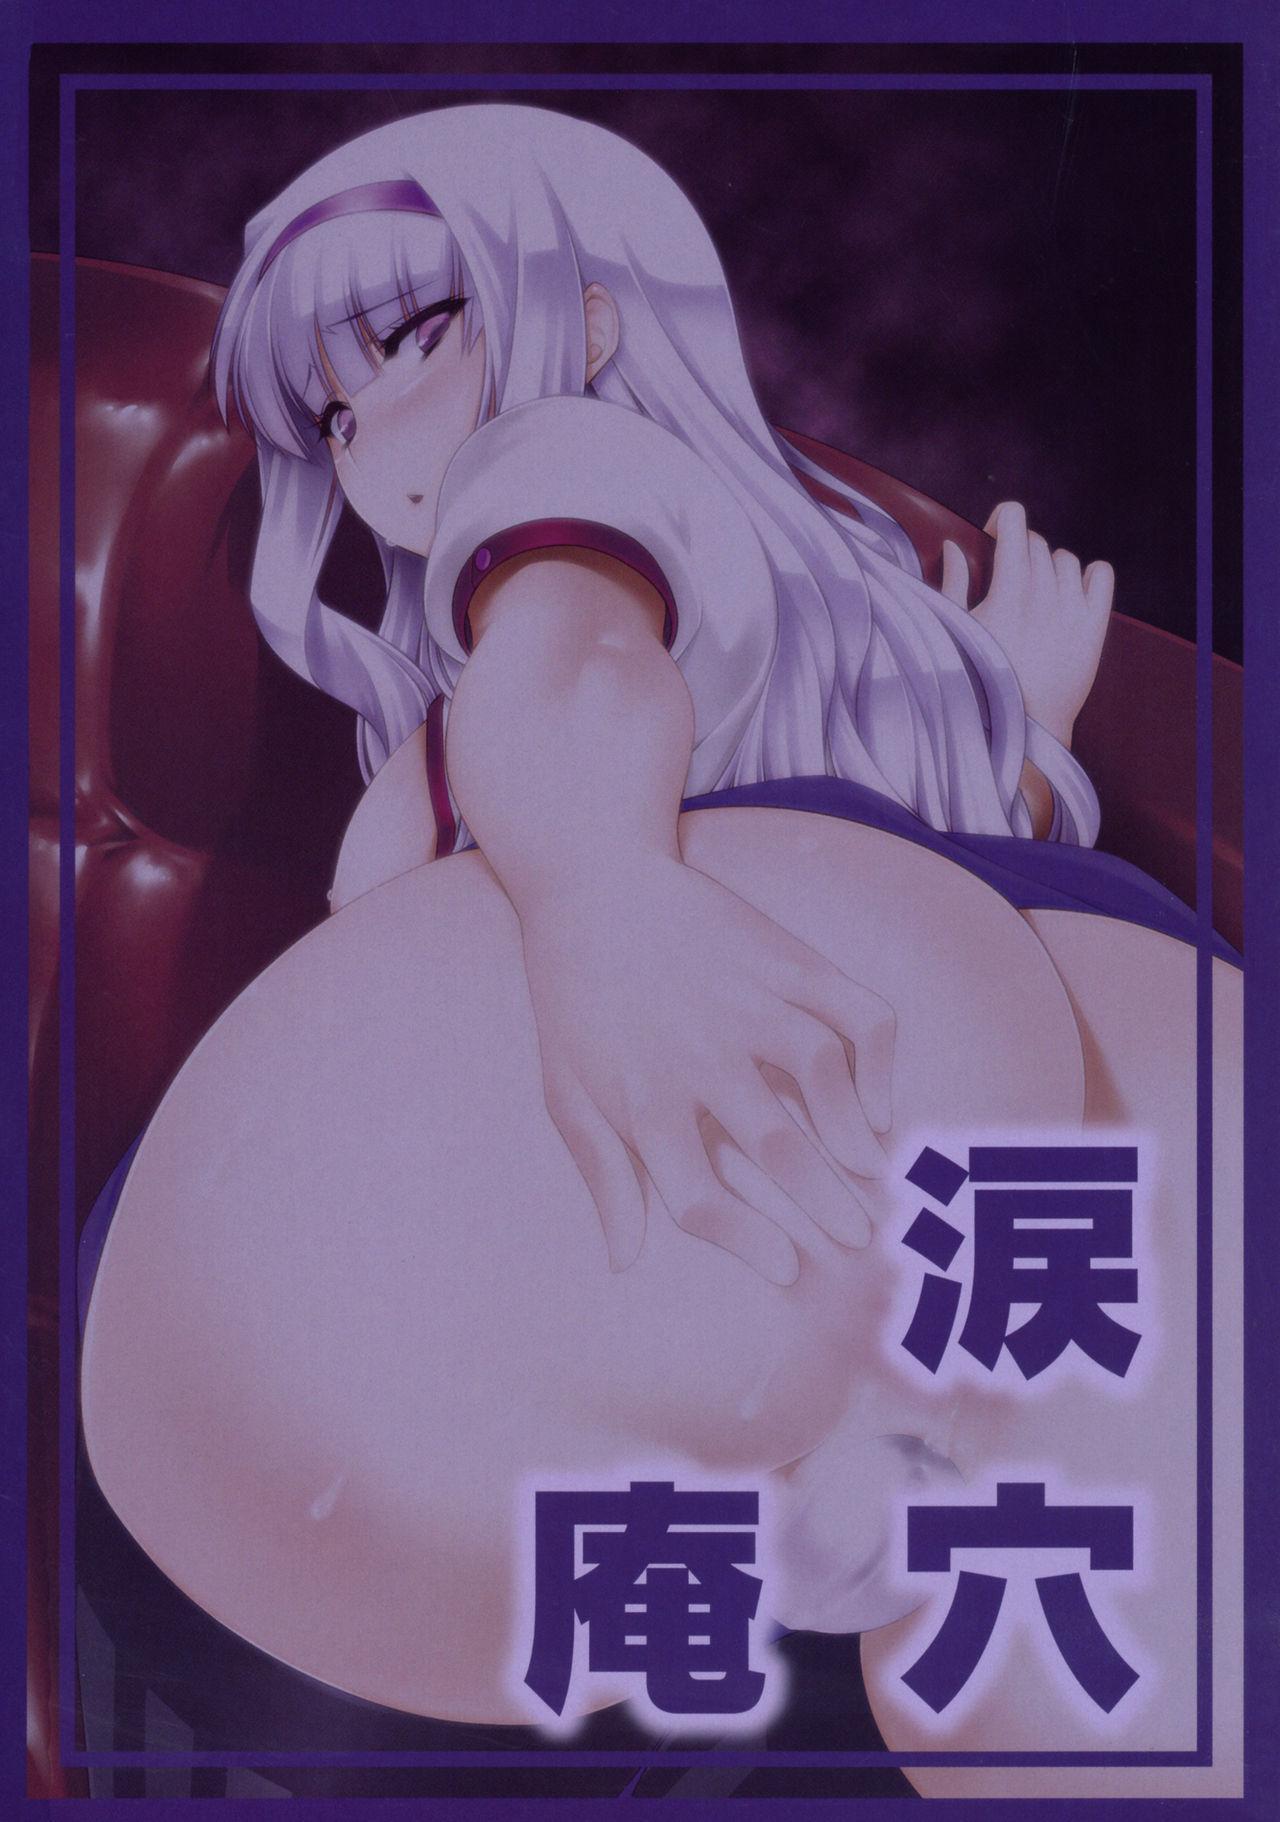 Oshirihime no Renbin | Compassion of the Anal Princess 21